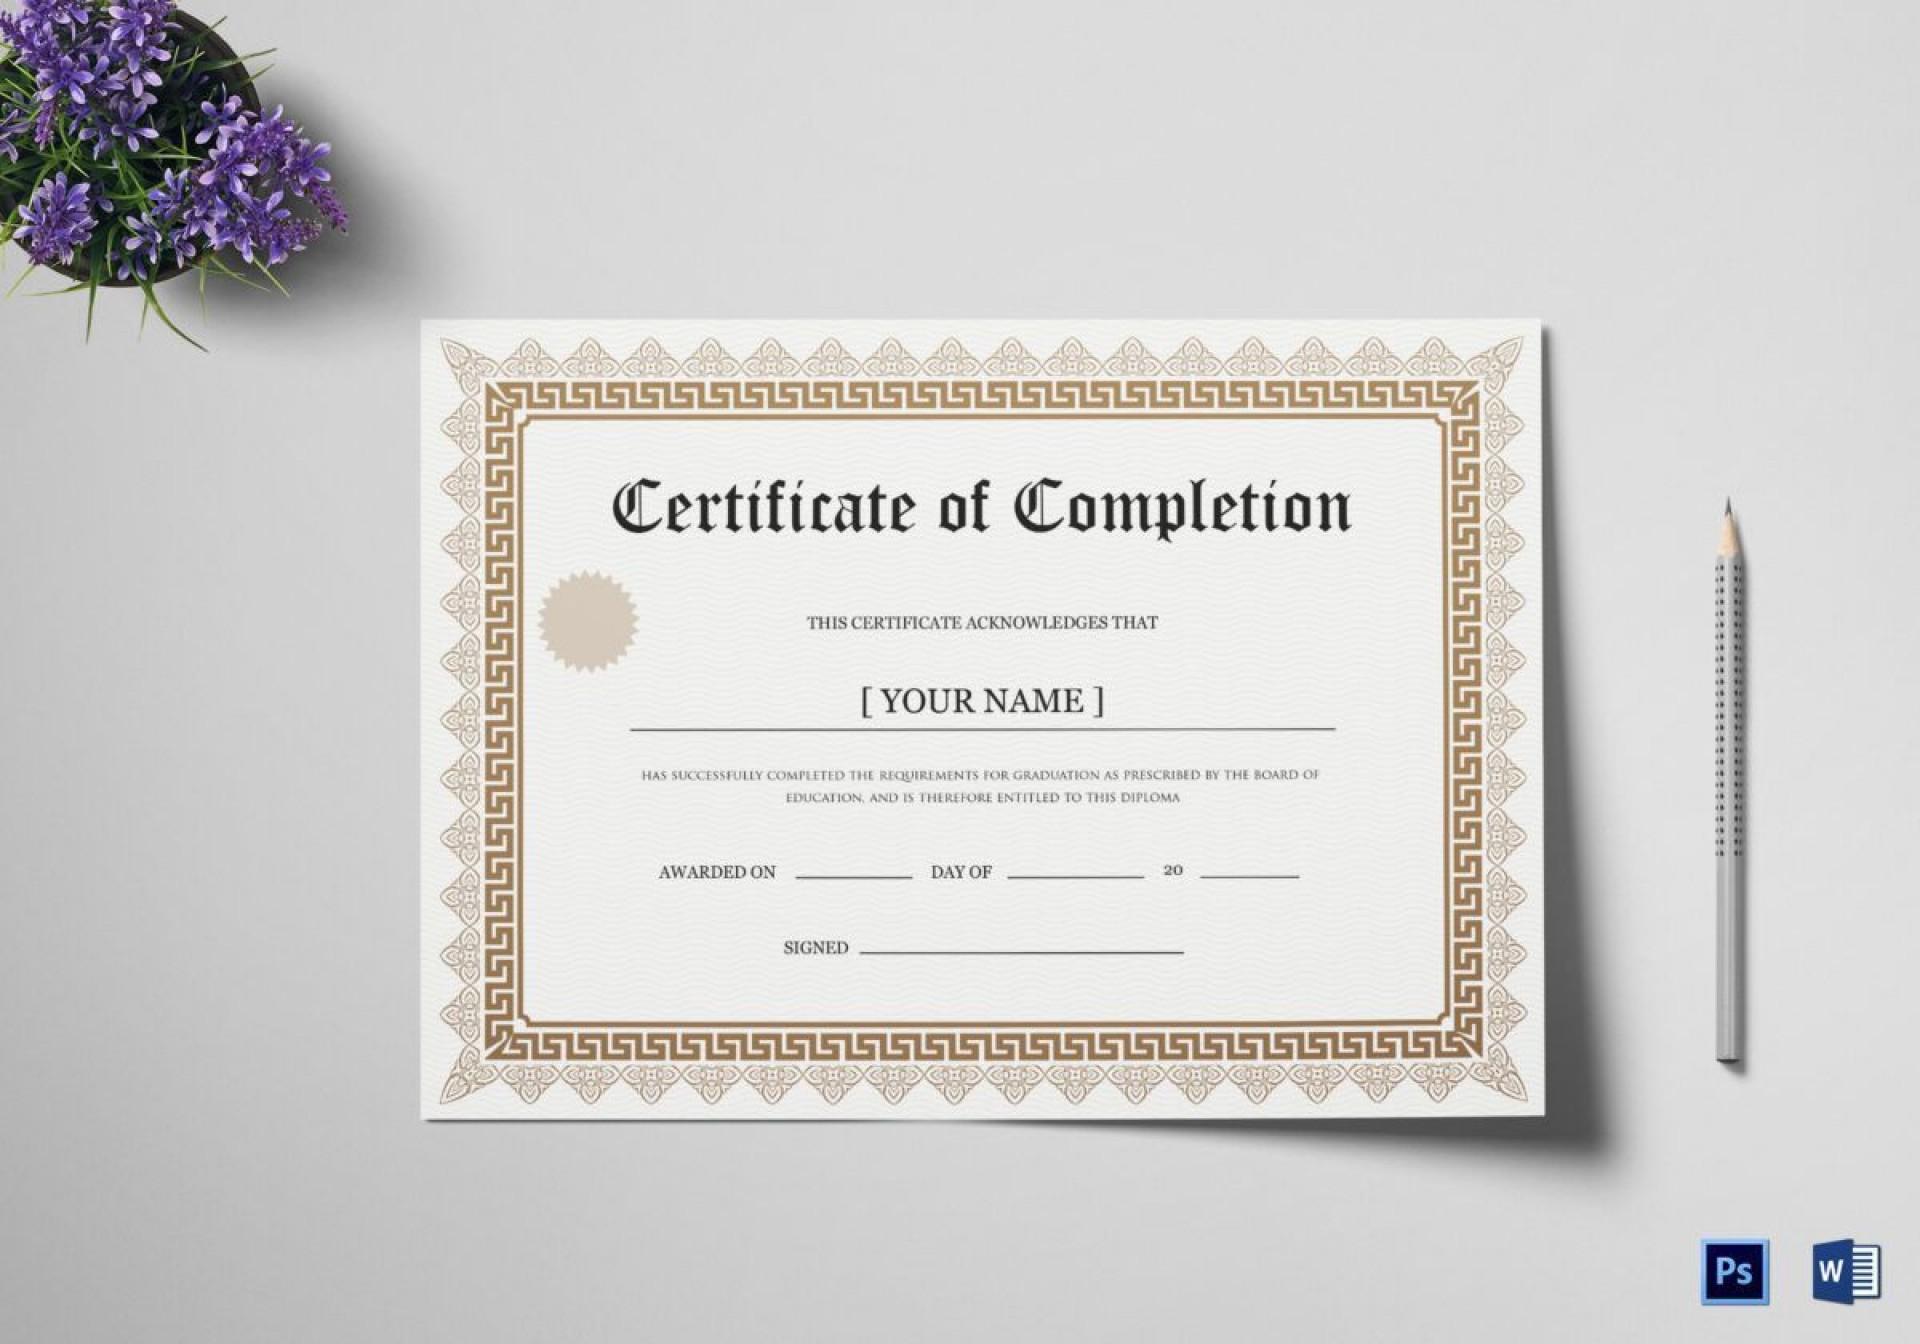 003 Fascinating Degree Certificate Template Word High Def 1920